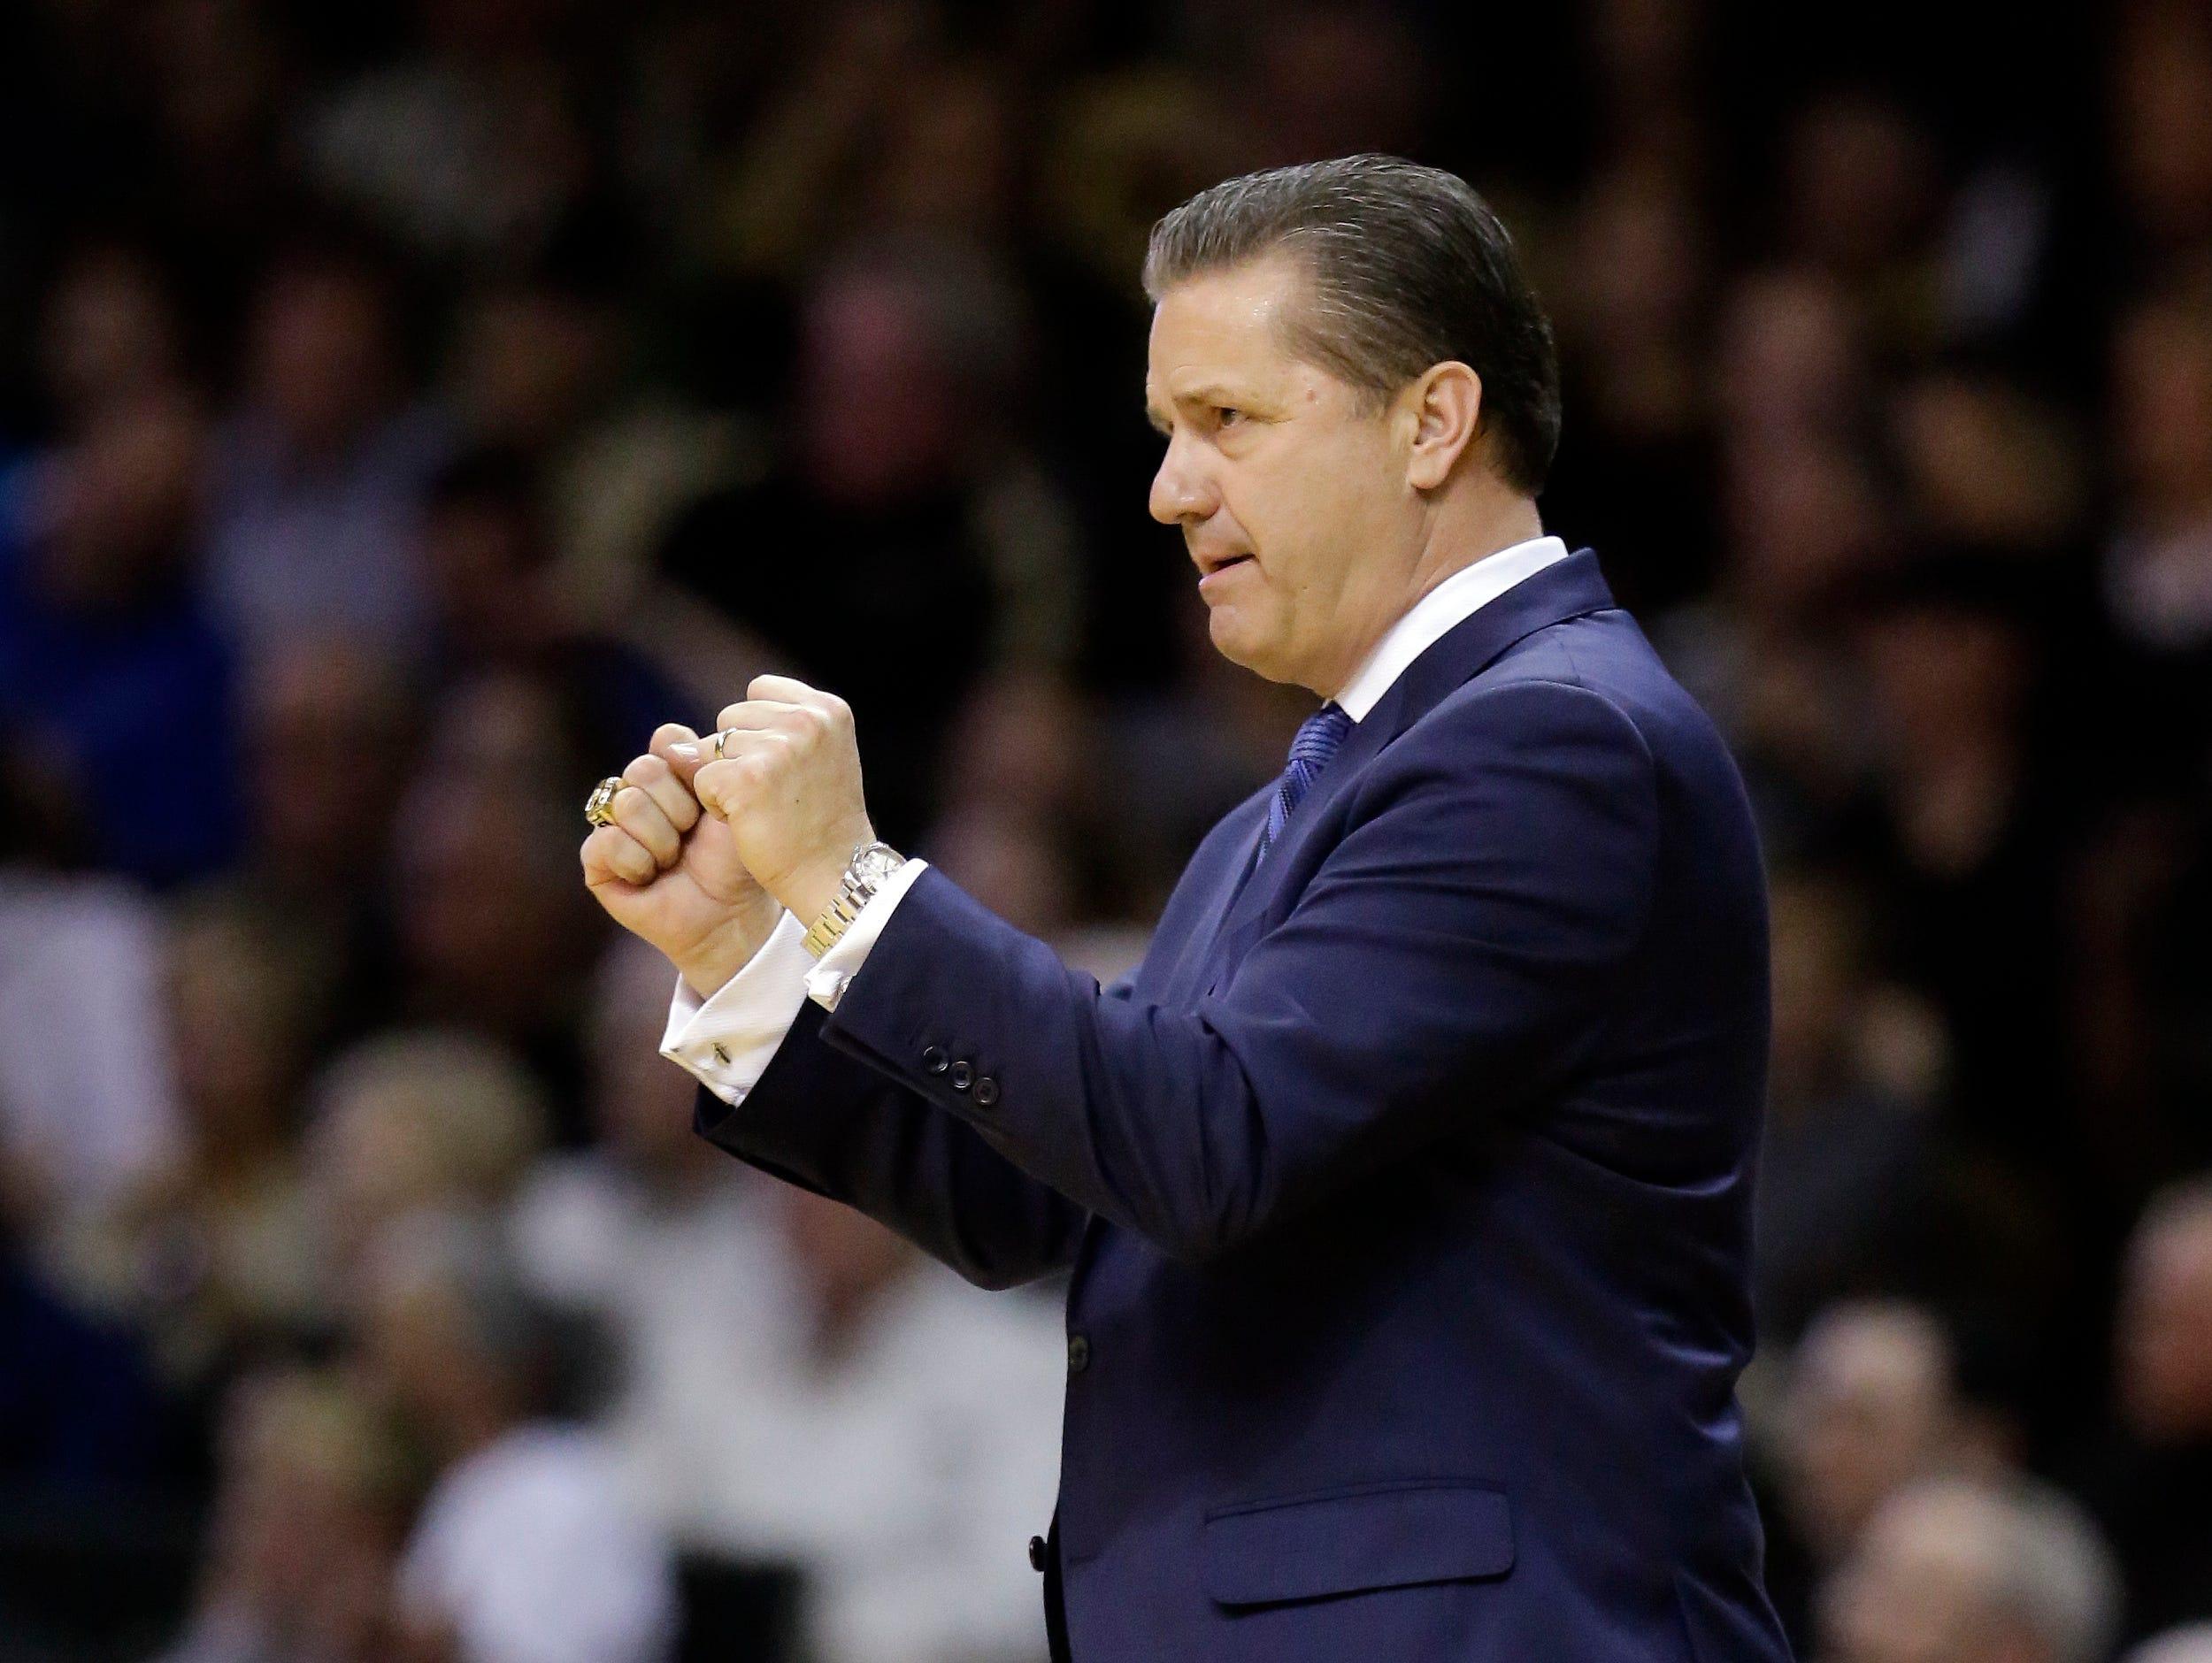 Kentucky head coach John Calipari gestures as he watches the action in the first half of an NCAA college basketball game against Vanderbilt Saturday, Feb. 27, 2016, in Nashville, Tenn. (AP Photo/Mark Humphrey)